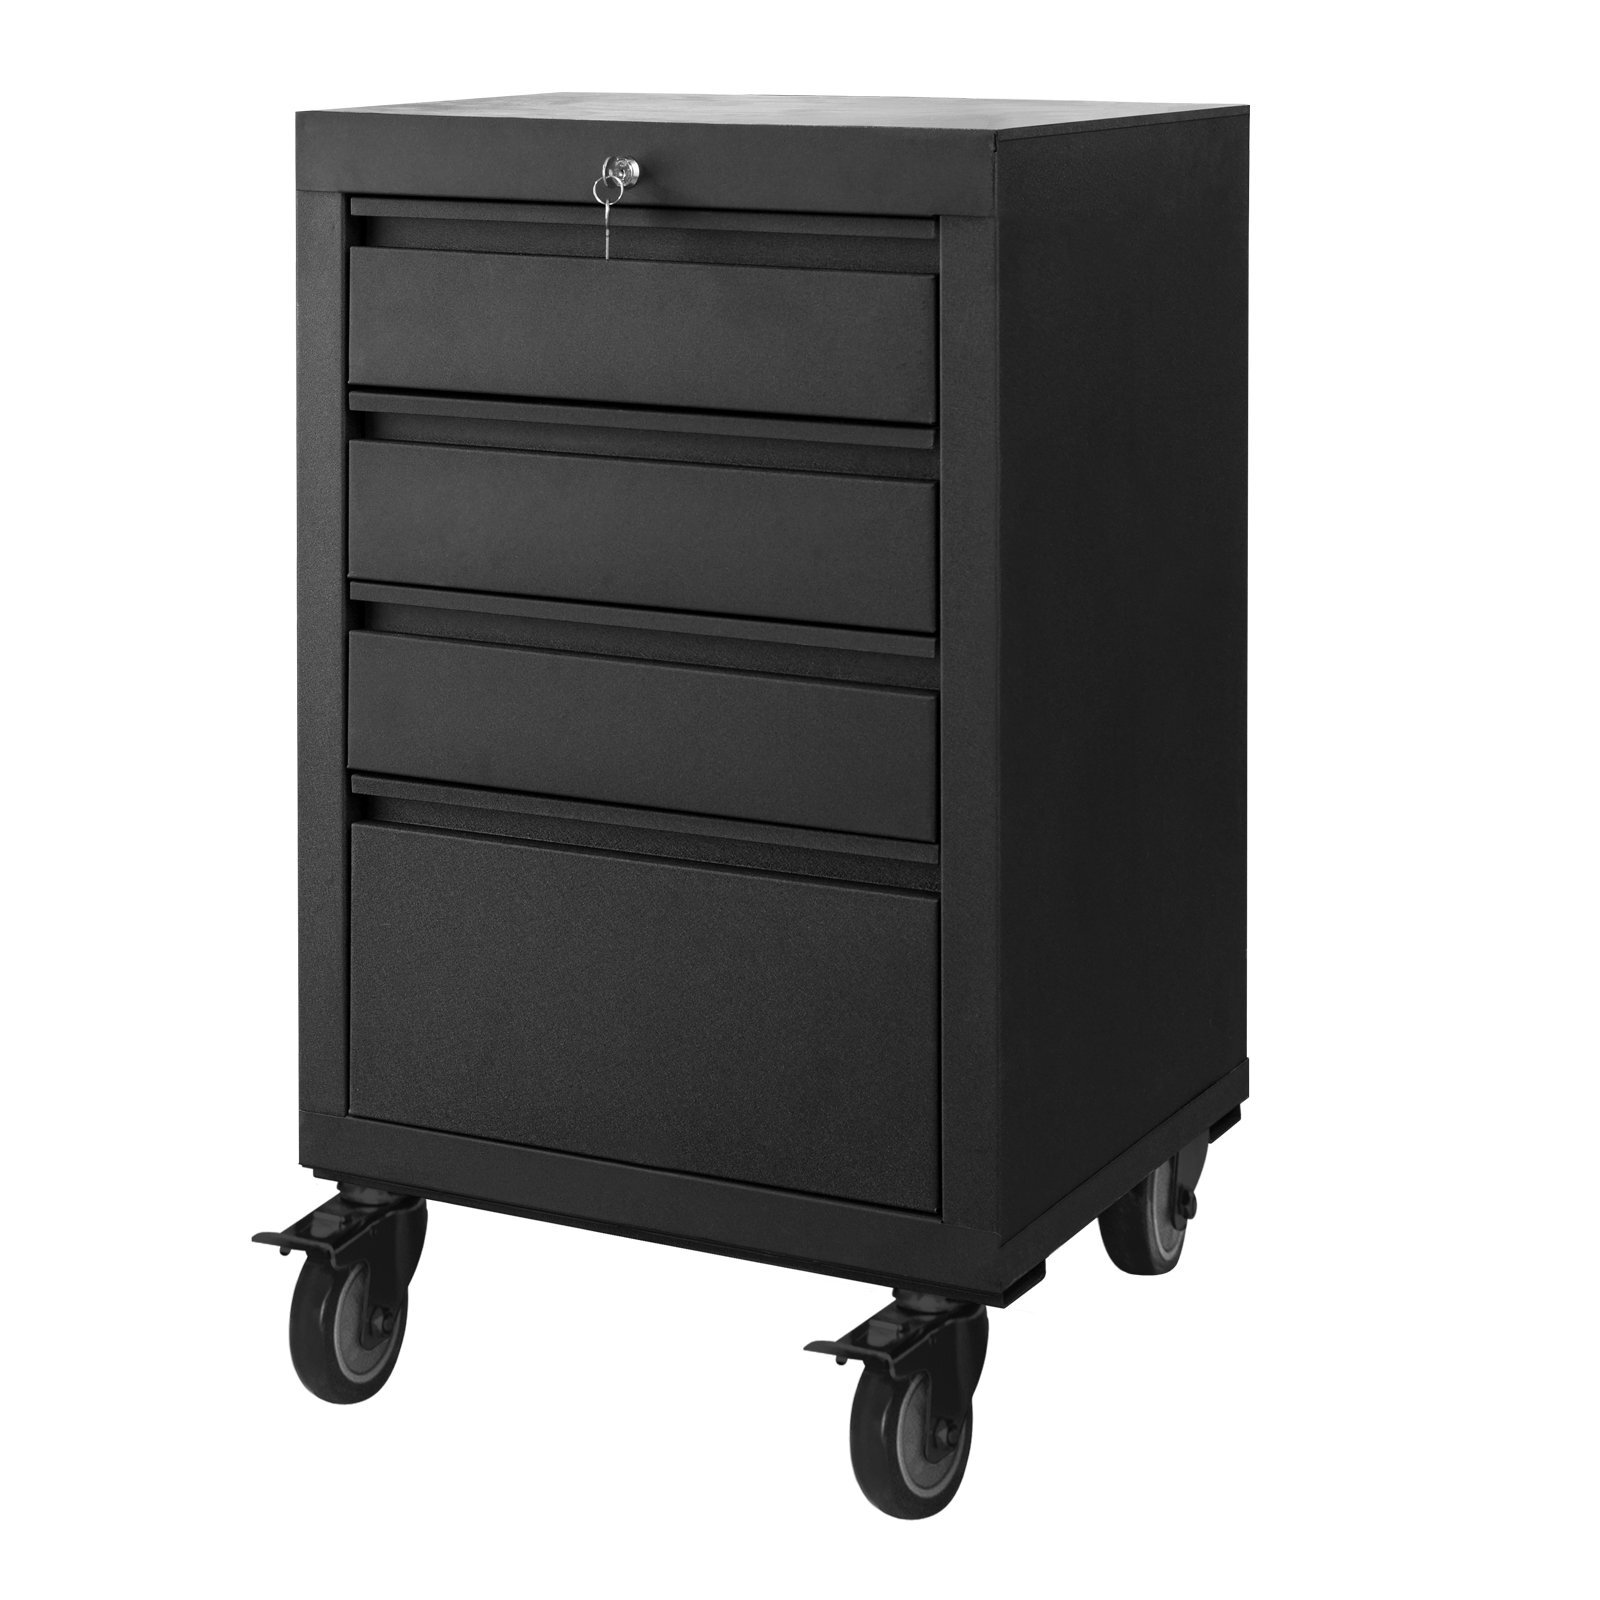 Pinnacle 810 x 520 x 500mm Matte Black 4 Drawer Mobile Storage Unit